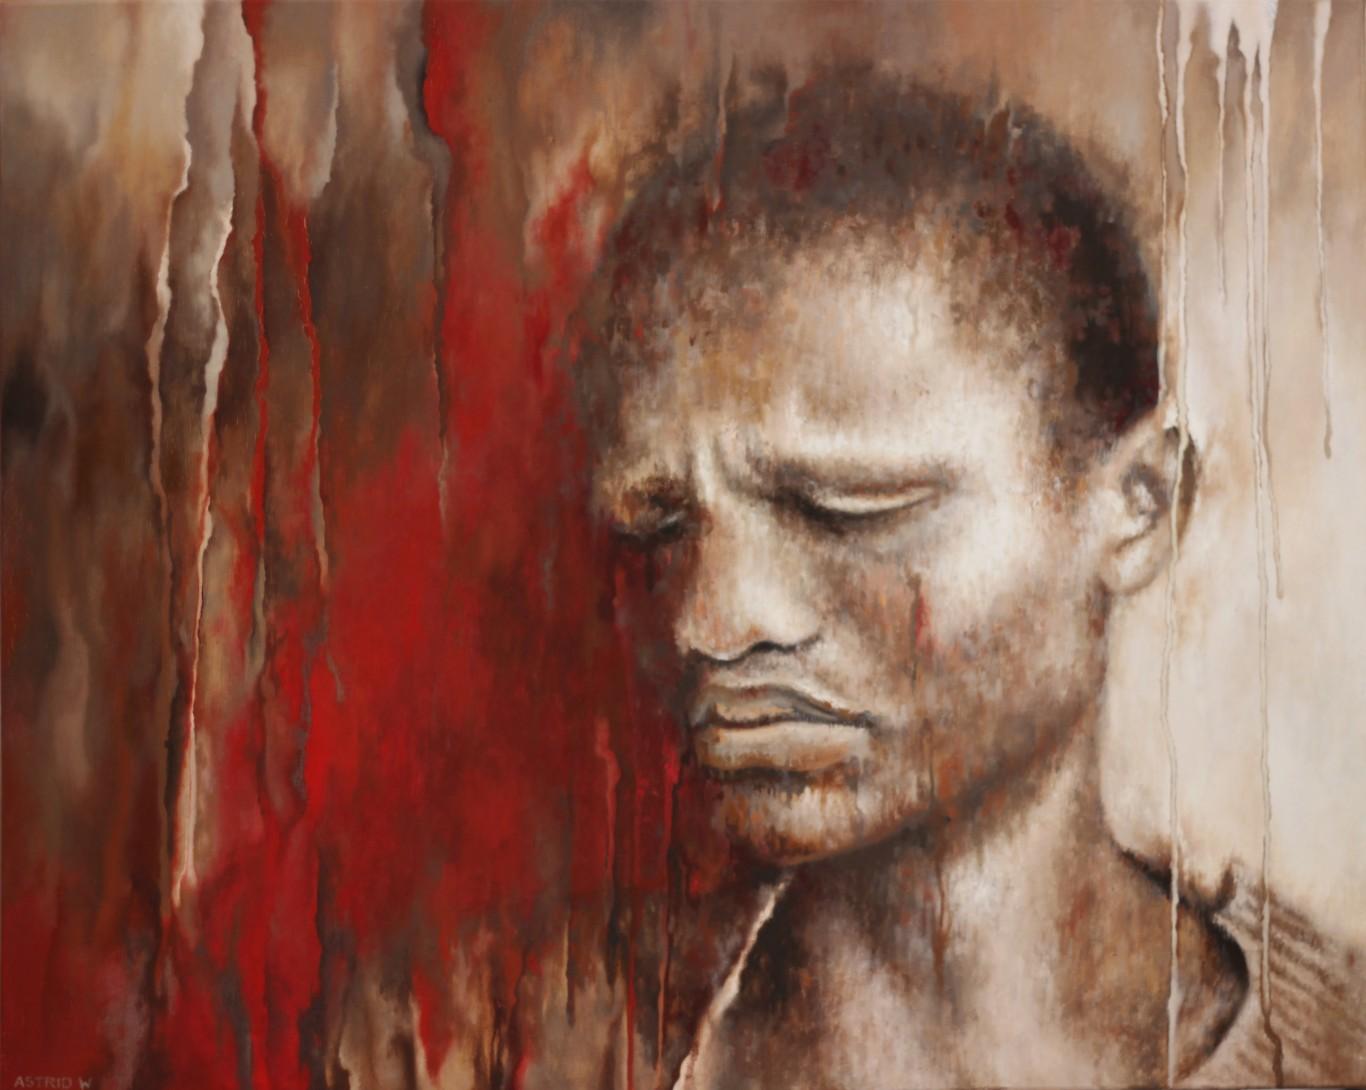 The portrait of Nokuphila Kulamo, by Astrid Warren